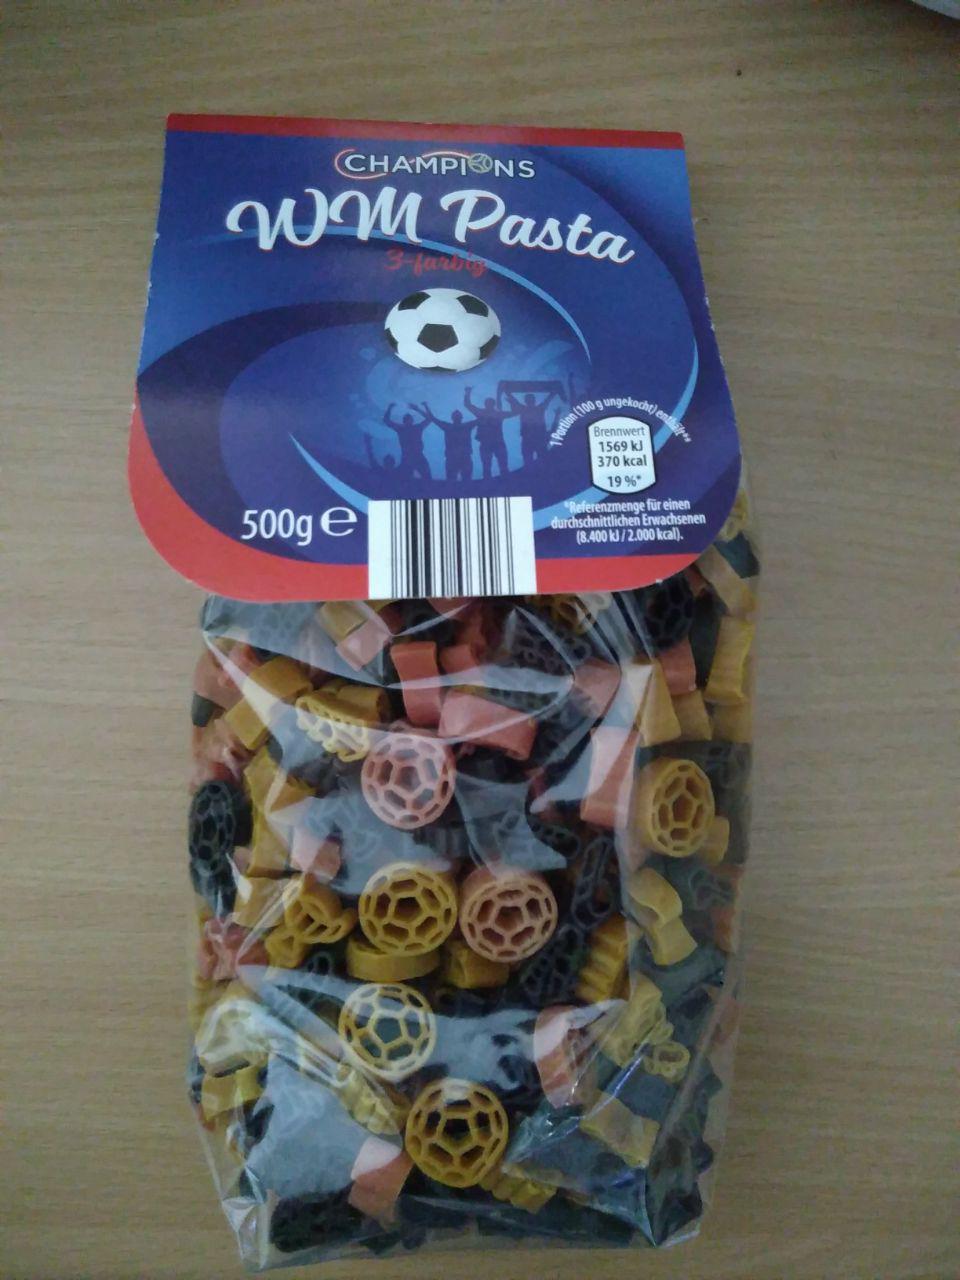 [lokal? Bad Neustadt/Saale] Aldi Champions bunte WM-Pasta 3-farbig 500g